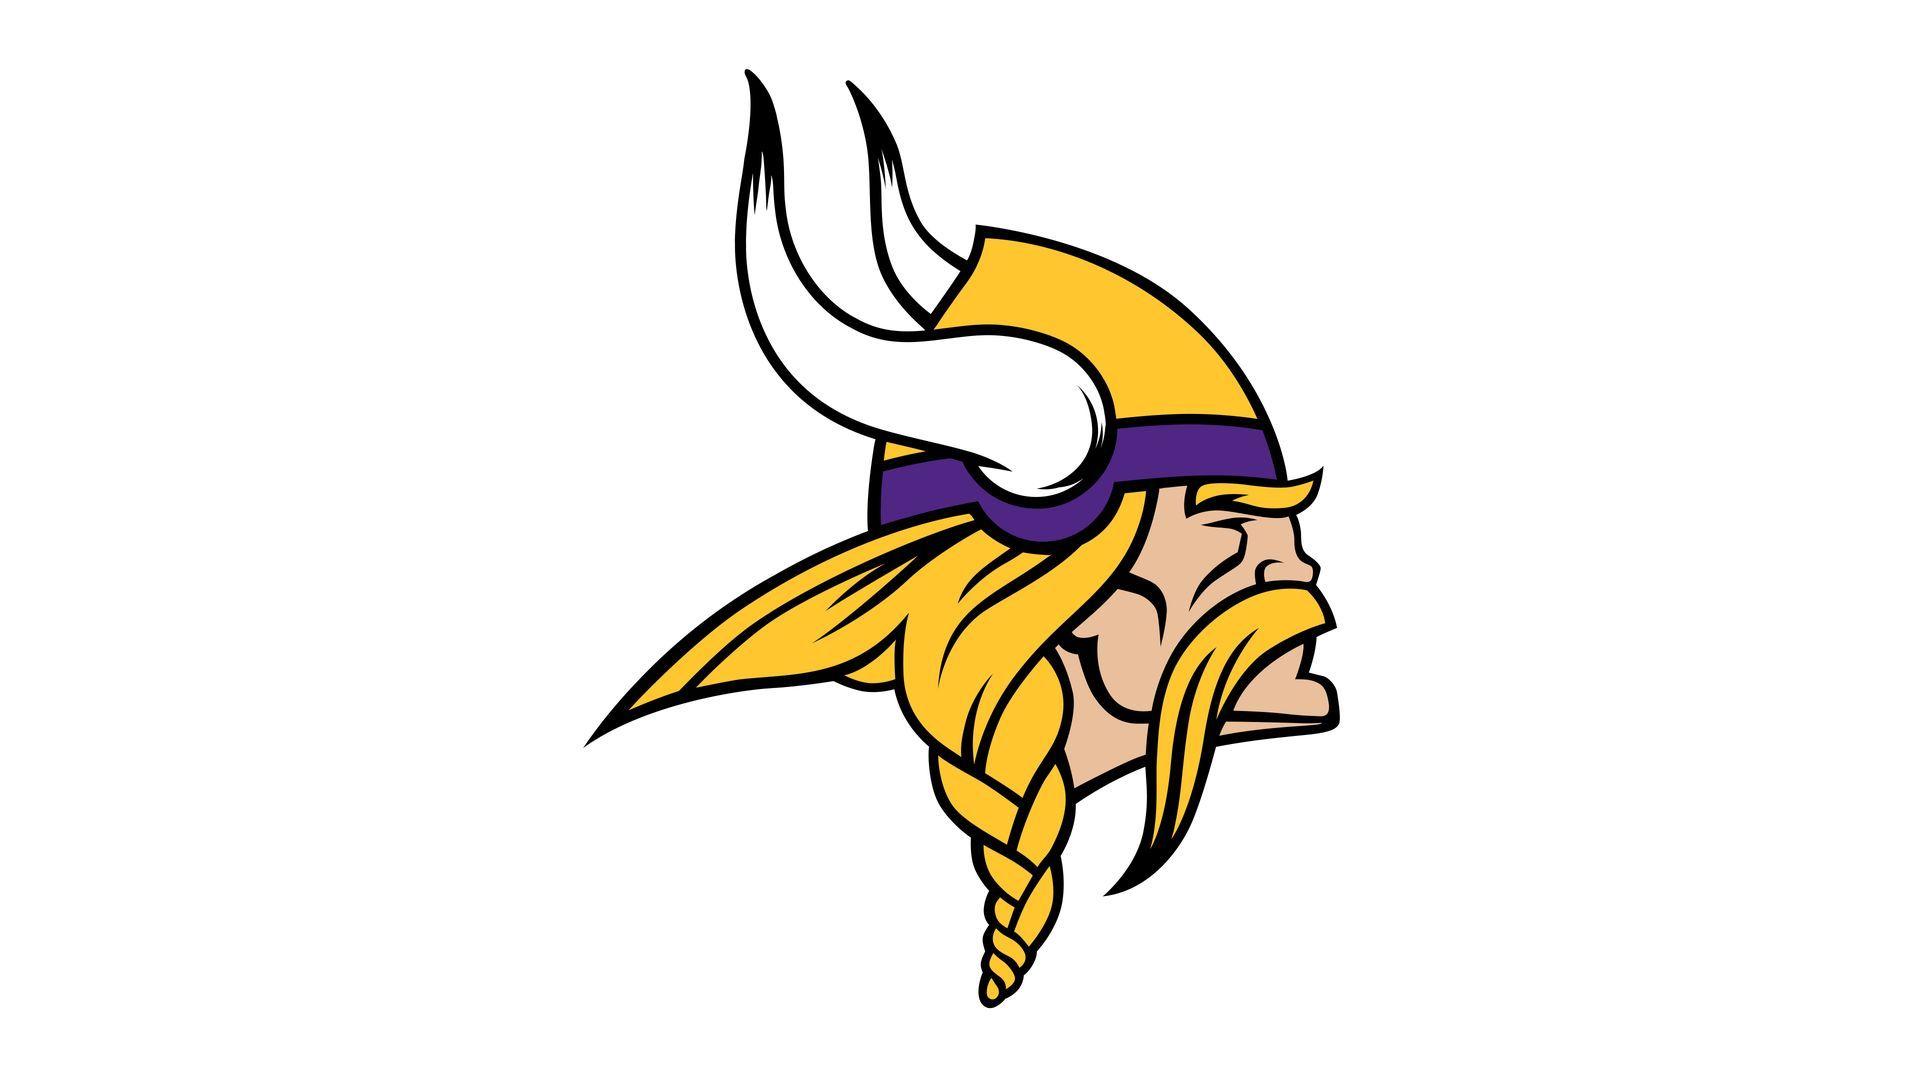 Minnesota Vikings full hd image